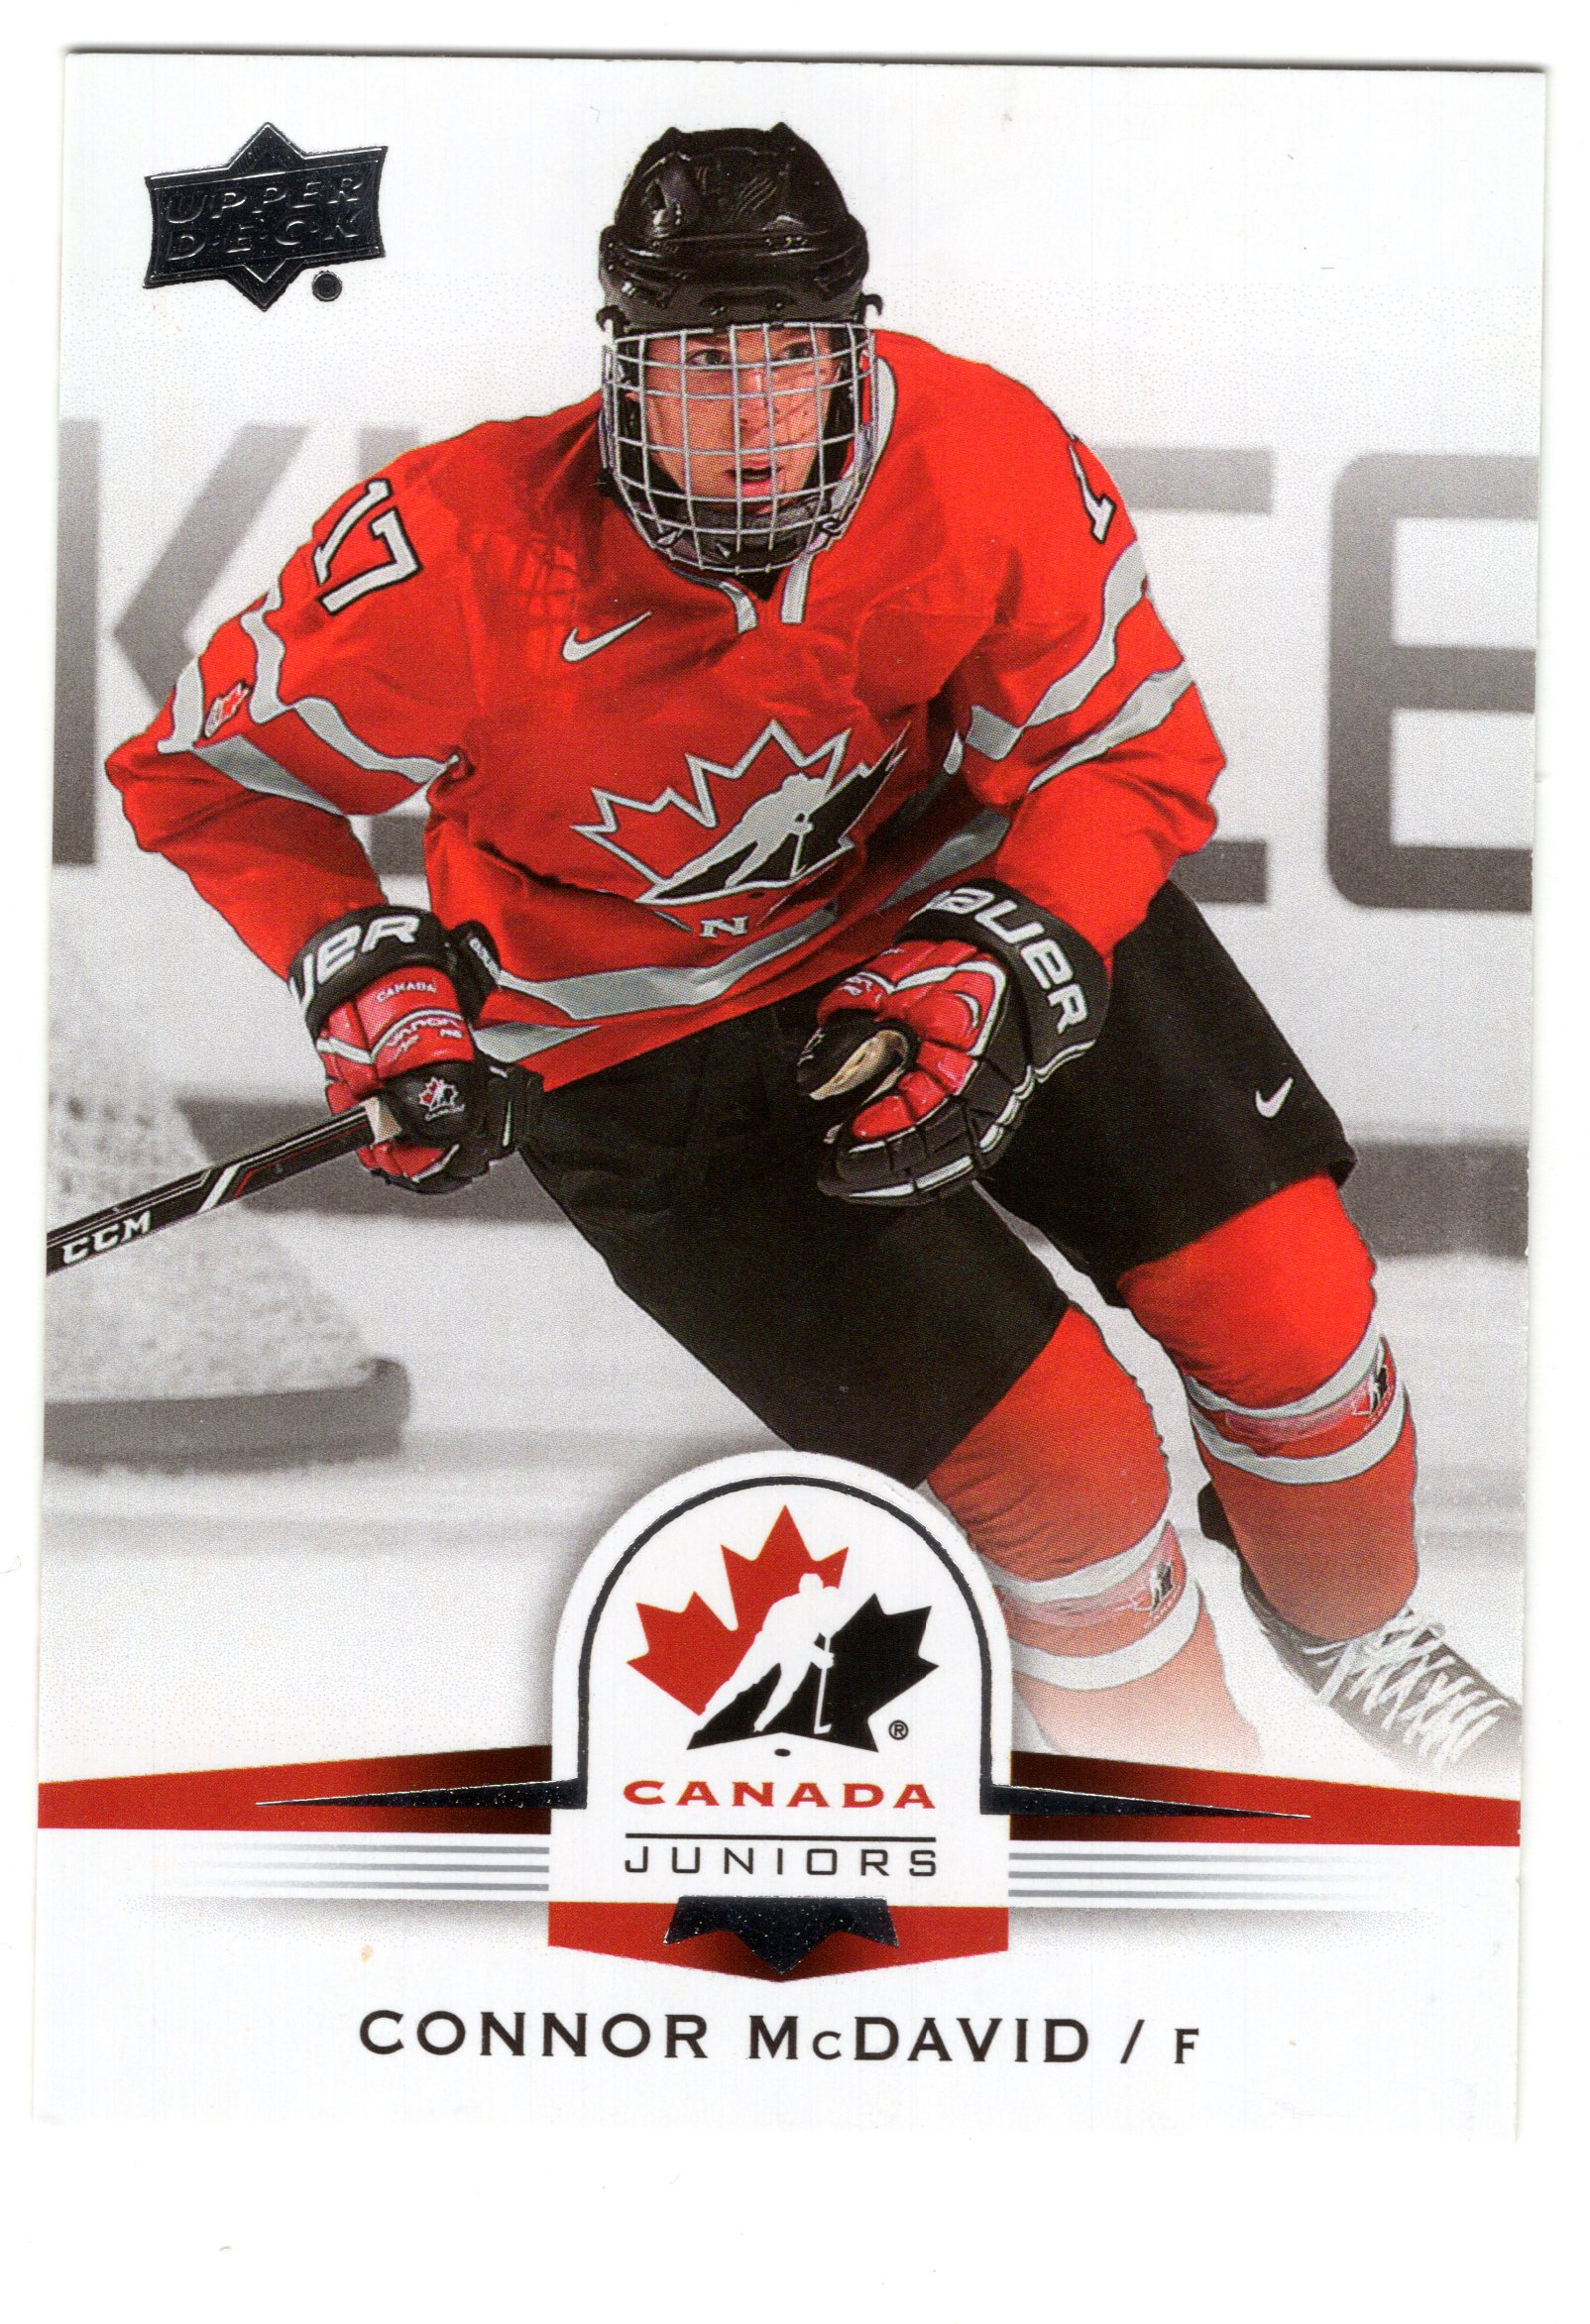 the latest c388d 7c797 14-15 Upper Deck Team Canada World Juniors Base Connor McDavid #110